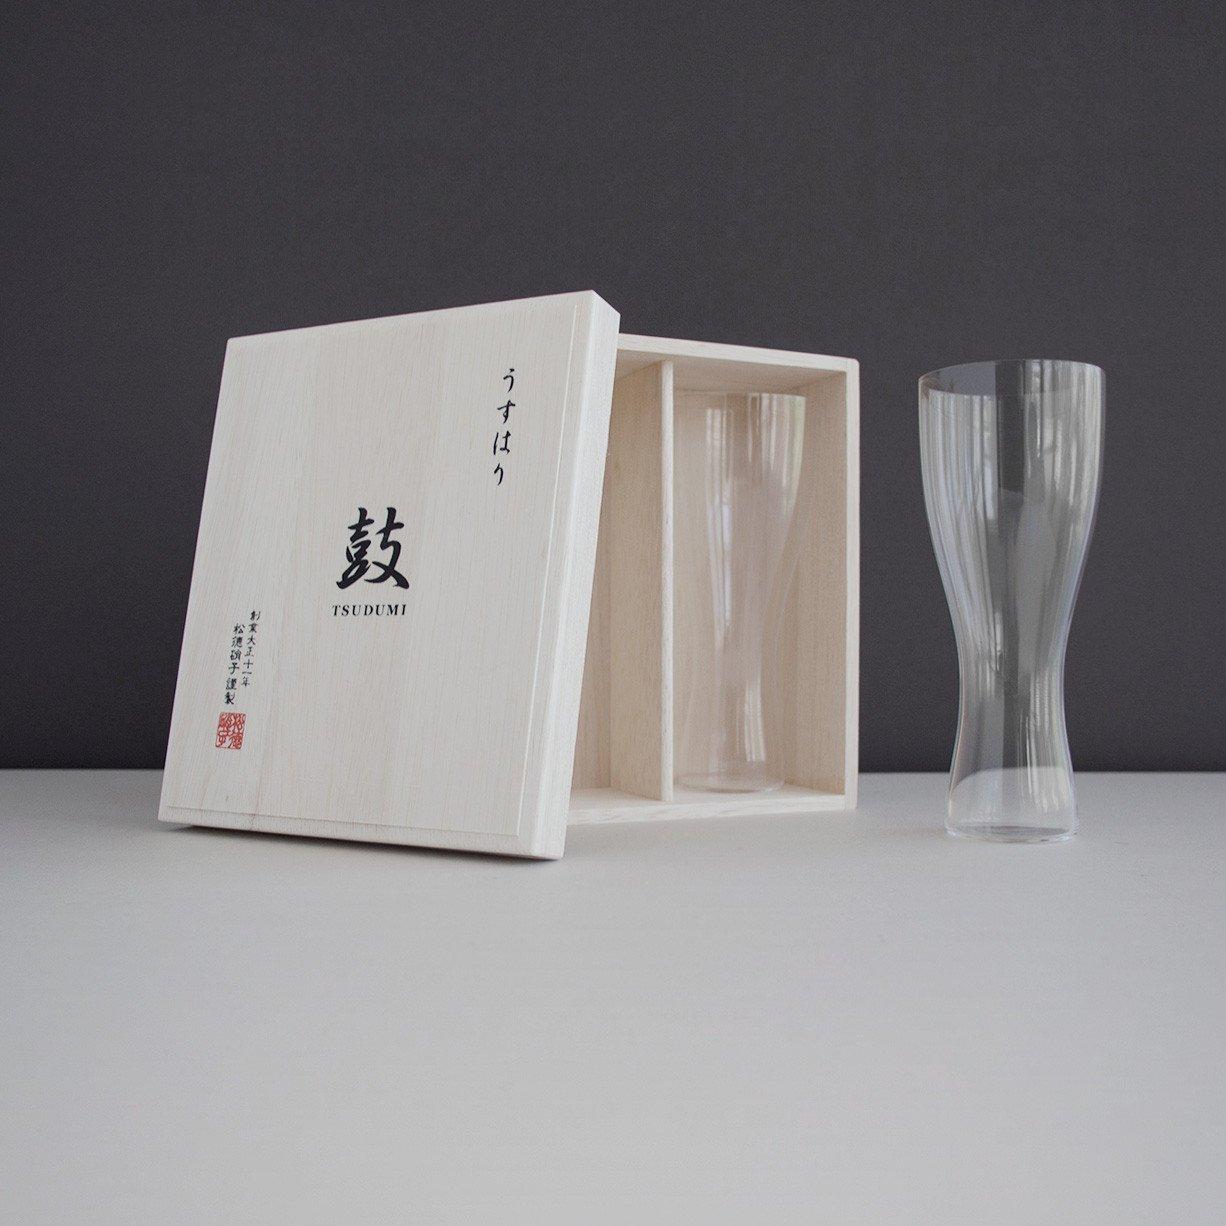 Usu Usuhari glass hourglass beer glass (Pilsner) wooden box 2P set